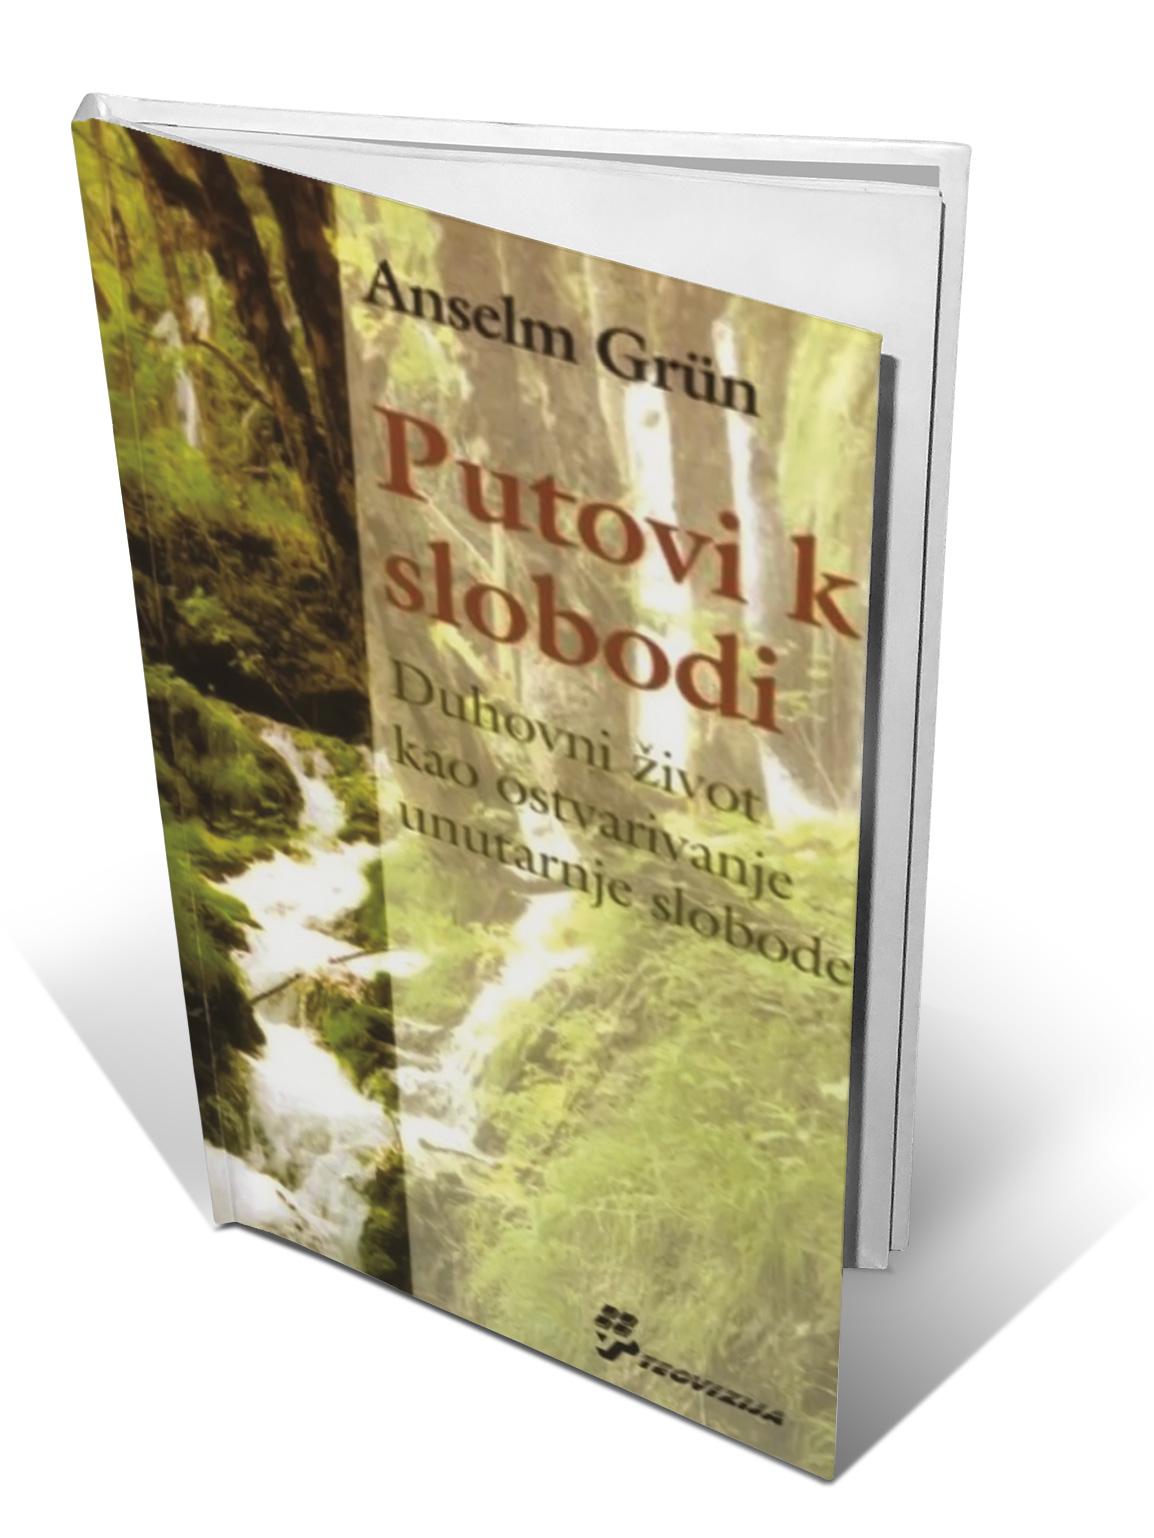 PUTOVI K SLOBODI - Anselm Grün